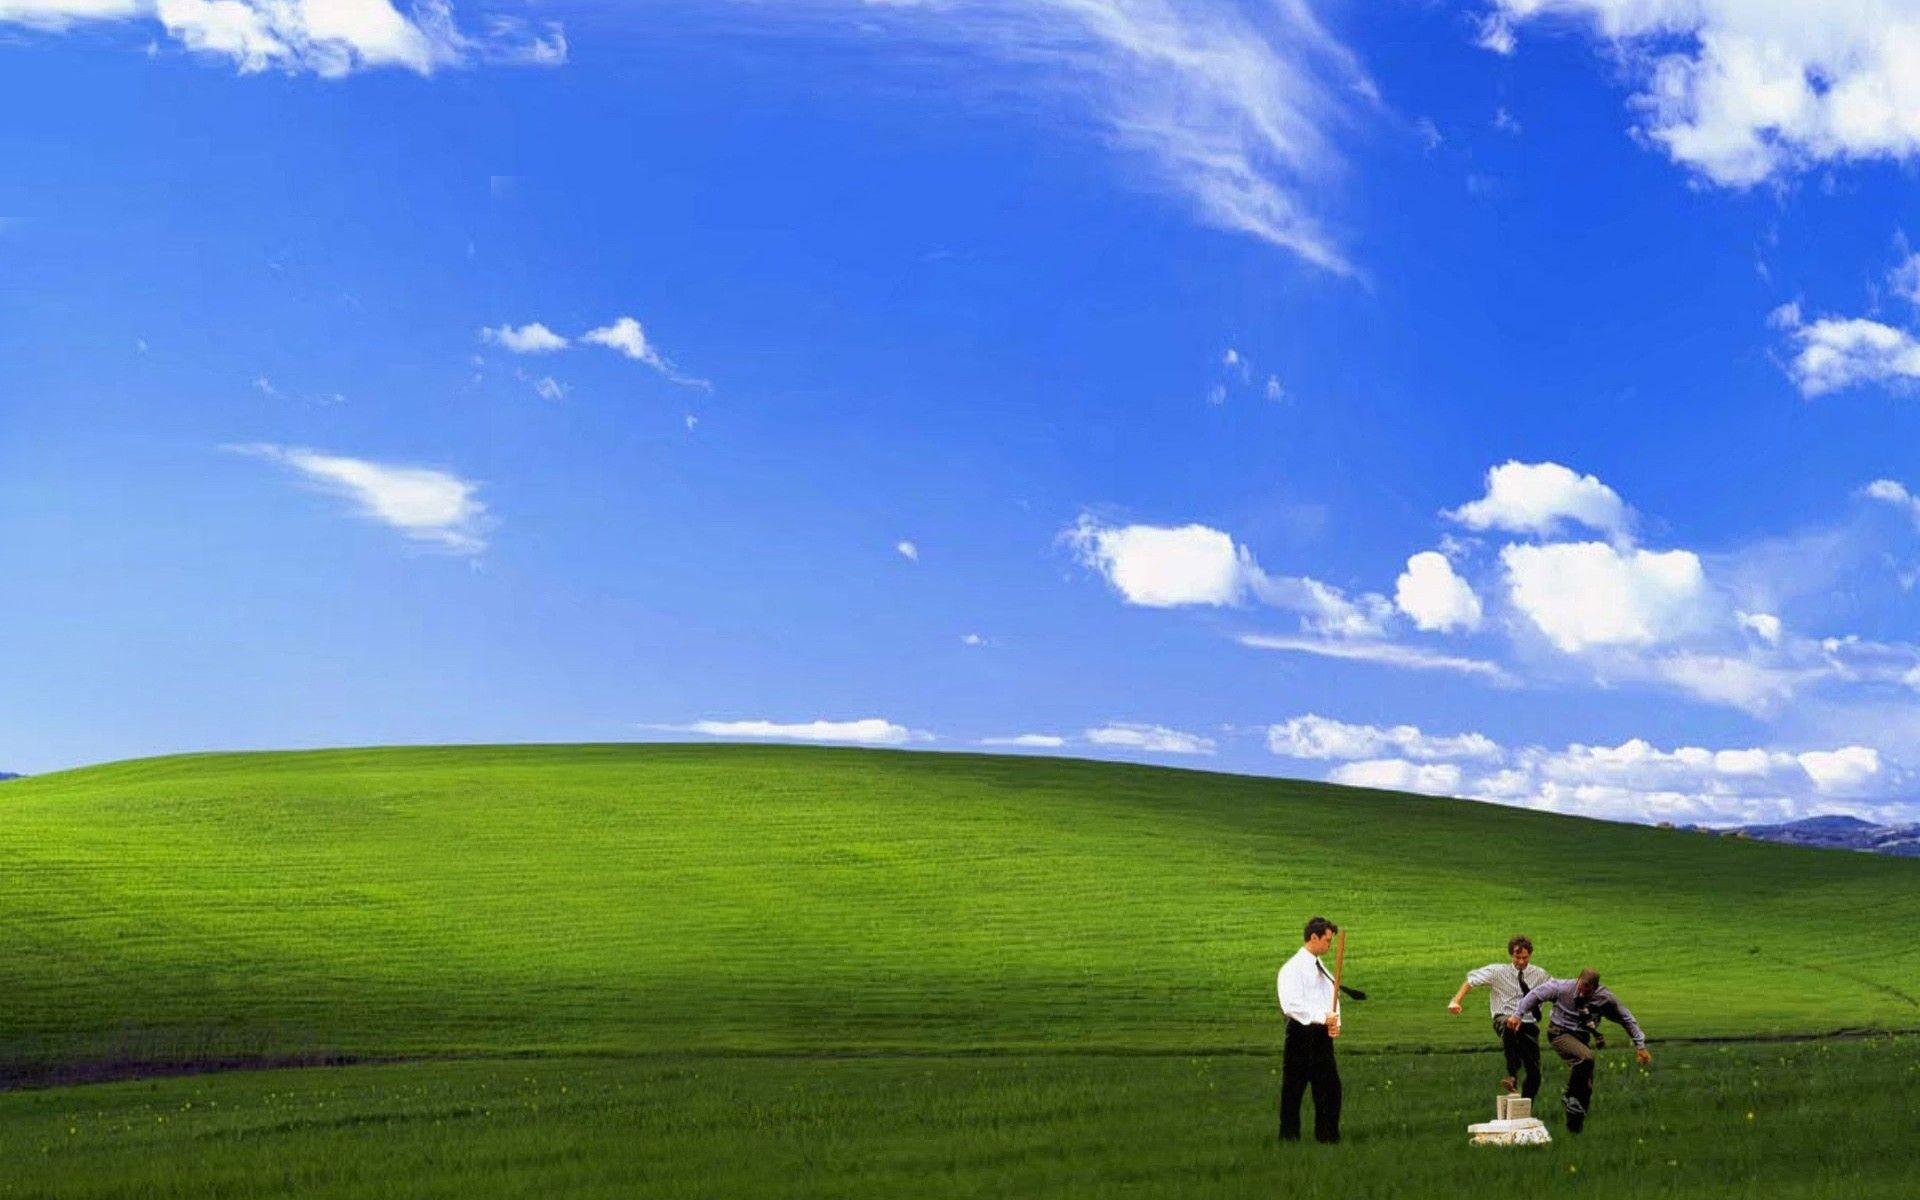 Funny Bliss Windows Xp Wallpaper